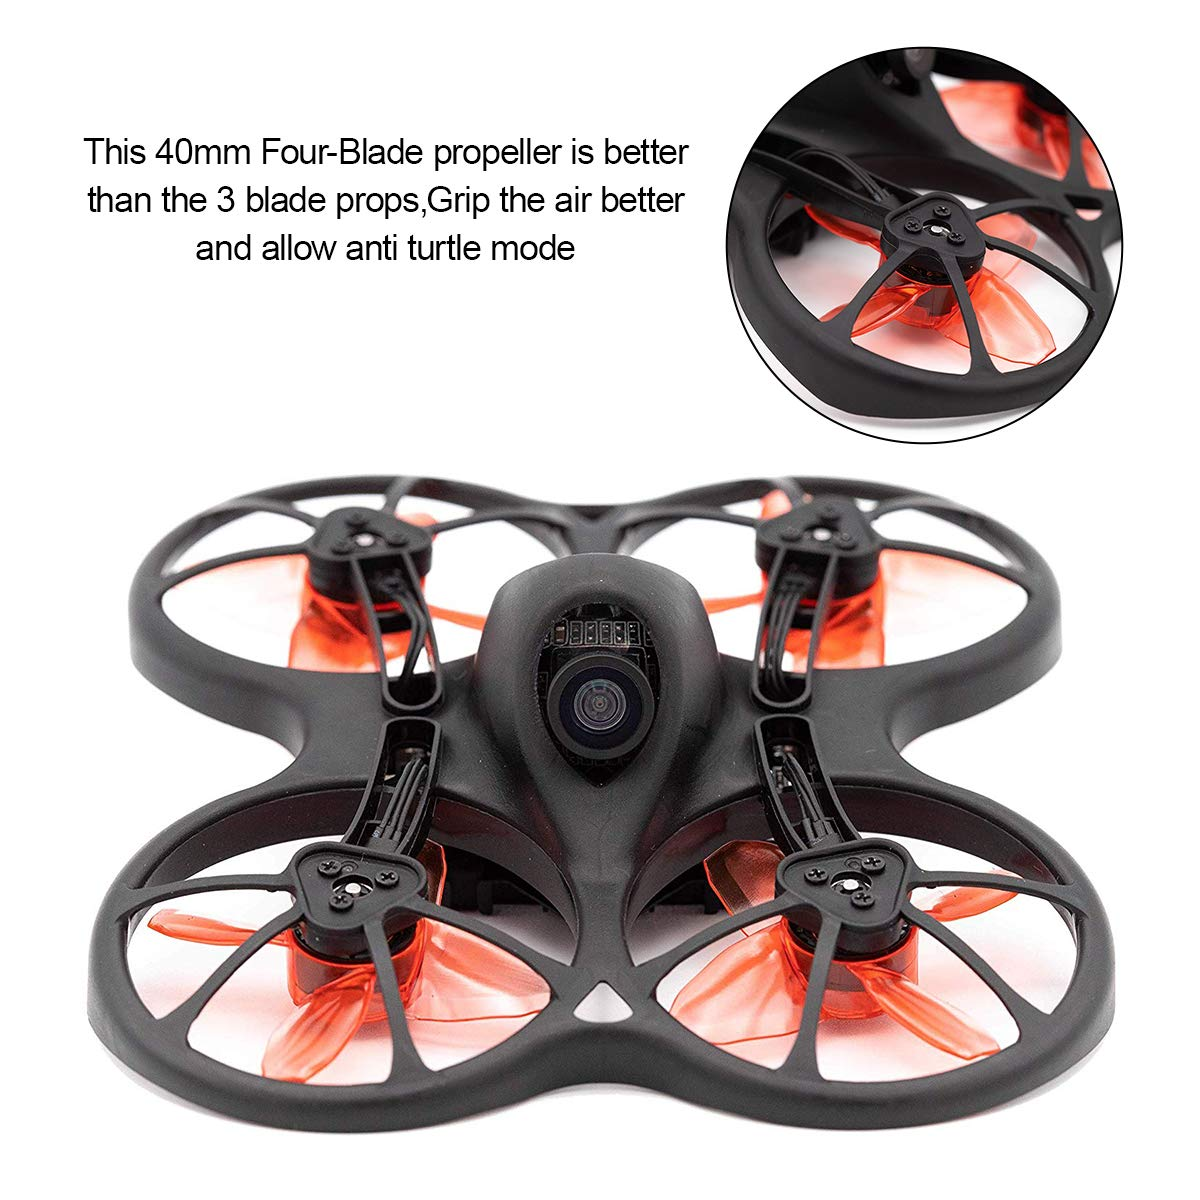 20pcs EMAX Avan Tinyhawk TH Turtlemode Propeller 40mm Four-Blade Props 4 Blade Propellers for 0802 Motor Indoor FPV Racing Drone Like Emax TinyhawkS